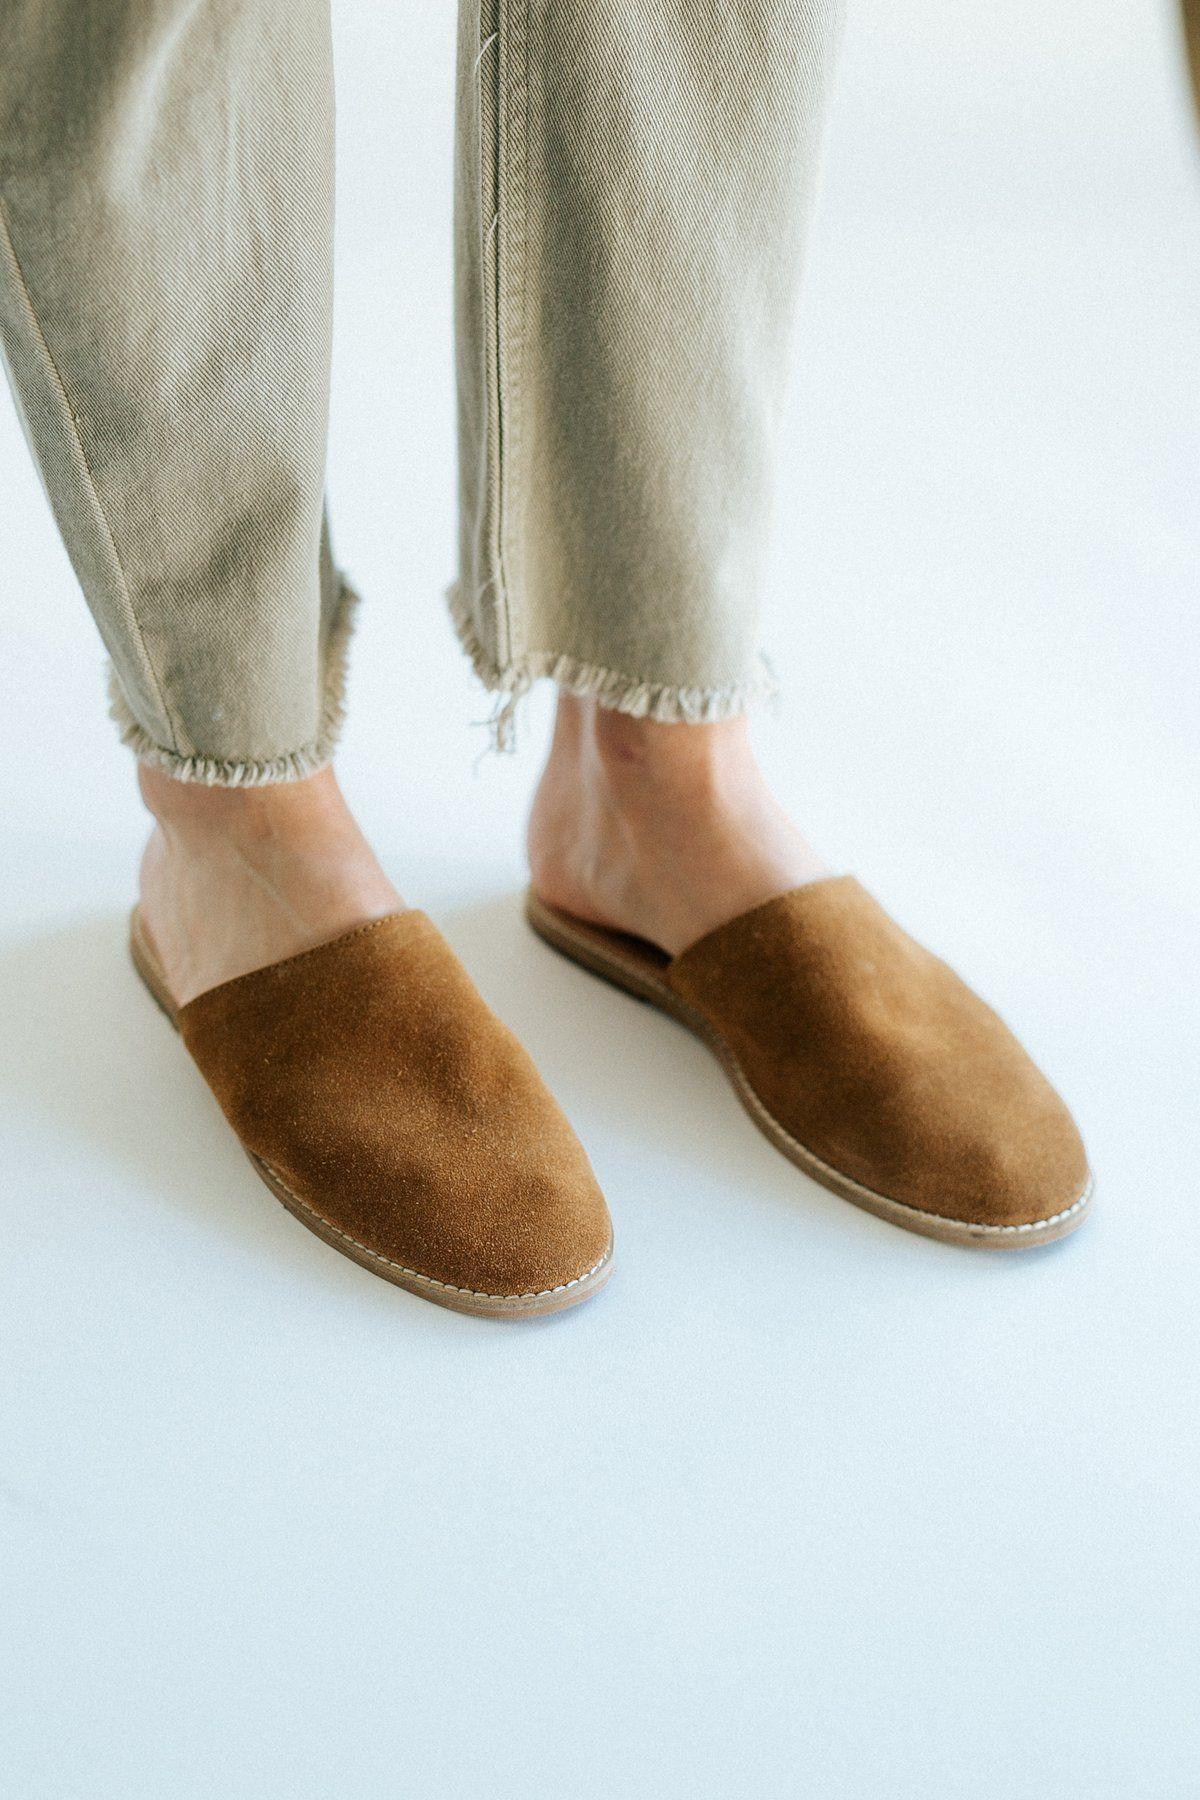 Free People Coronada Slip-On Flat